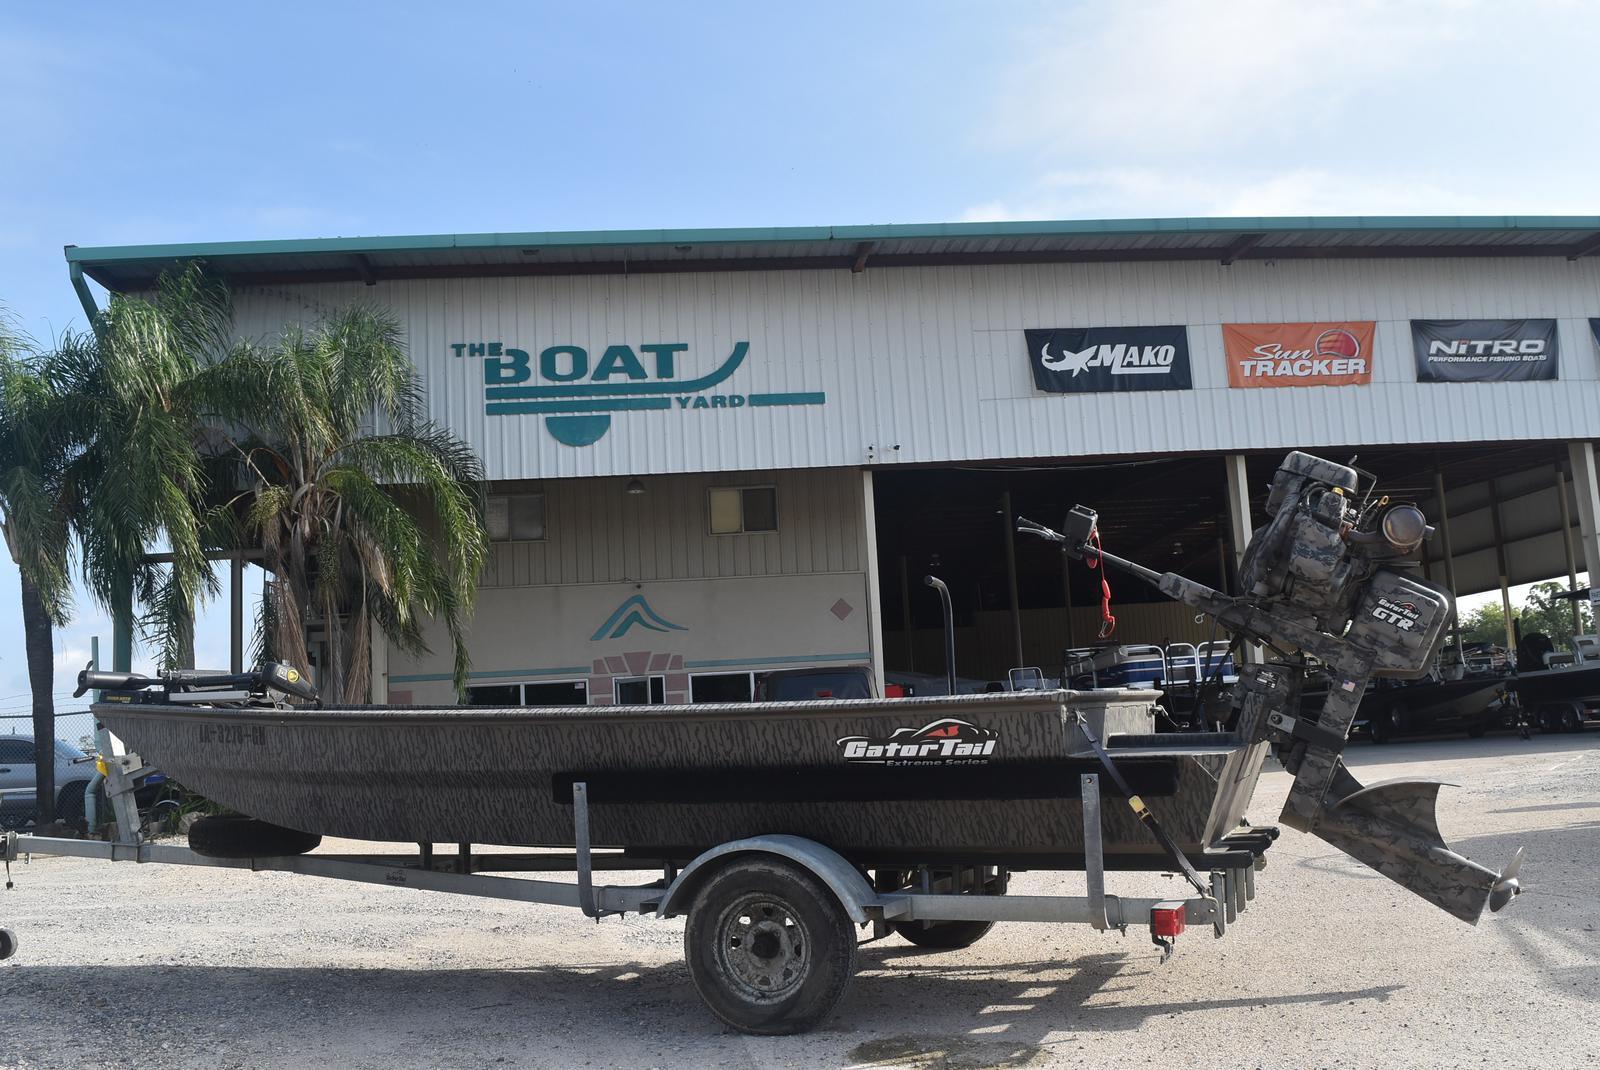 Inventory The Boat Yard Inc  Marrero, LA (504) 340-3175